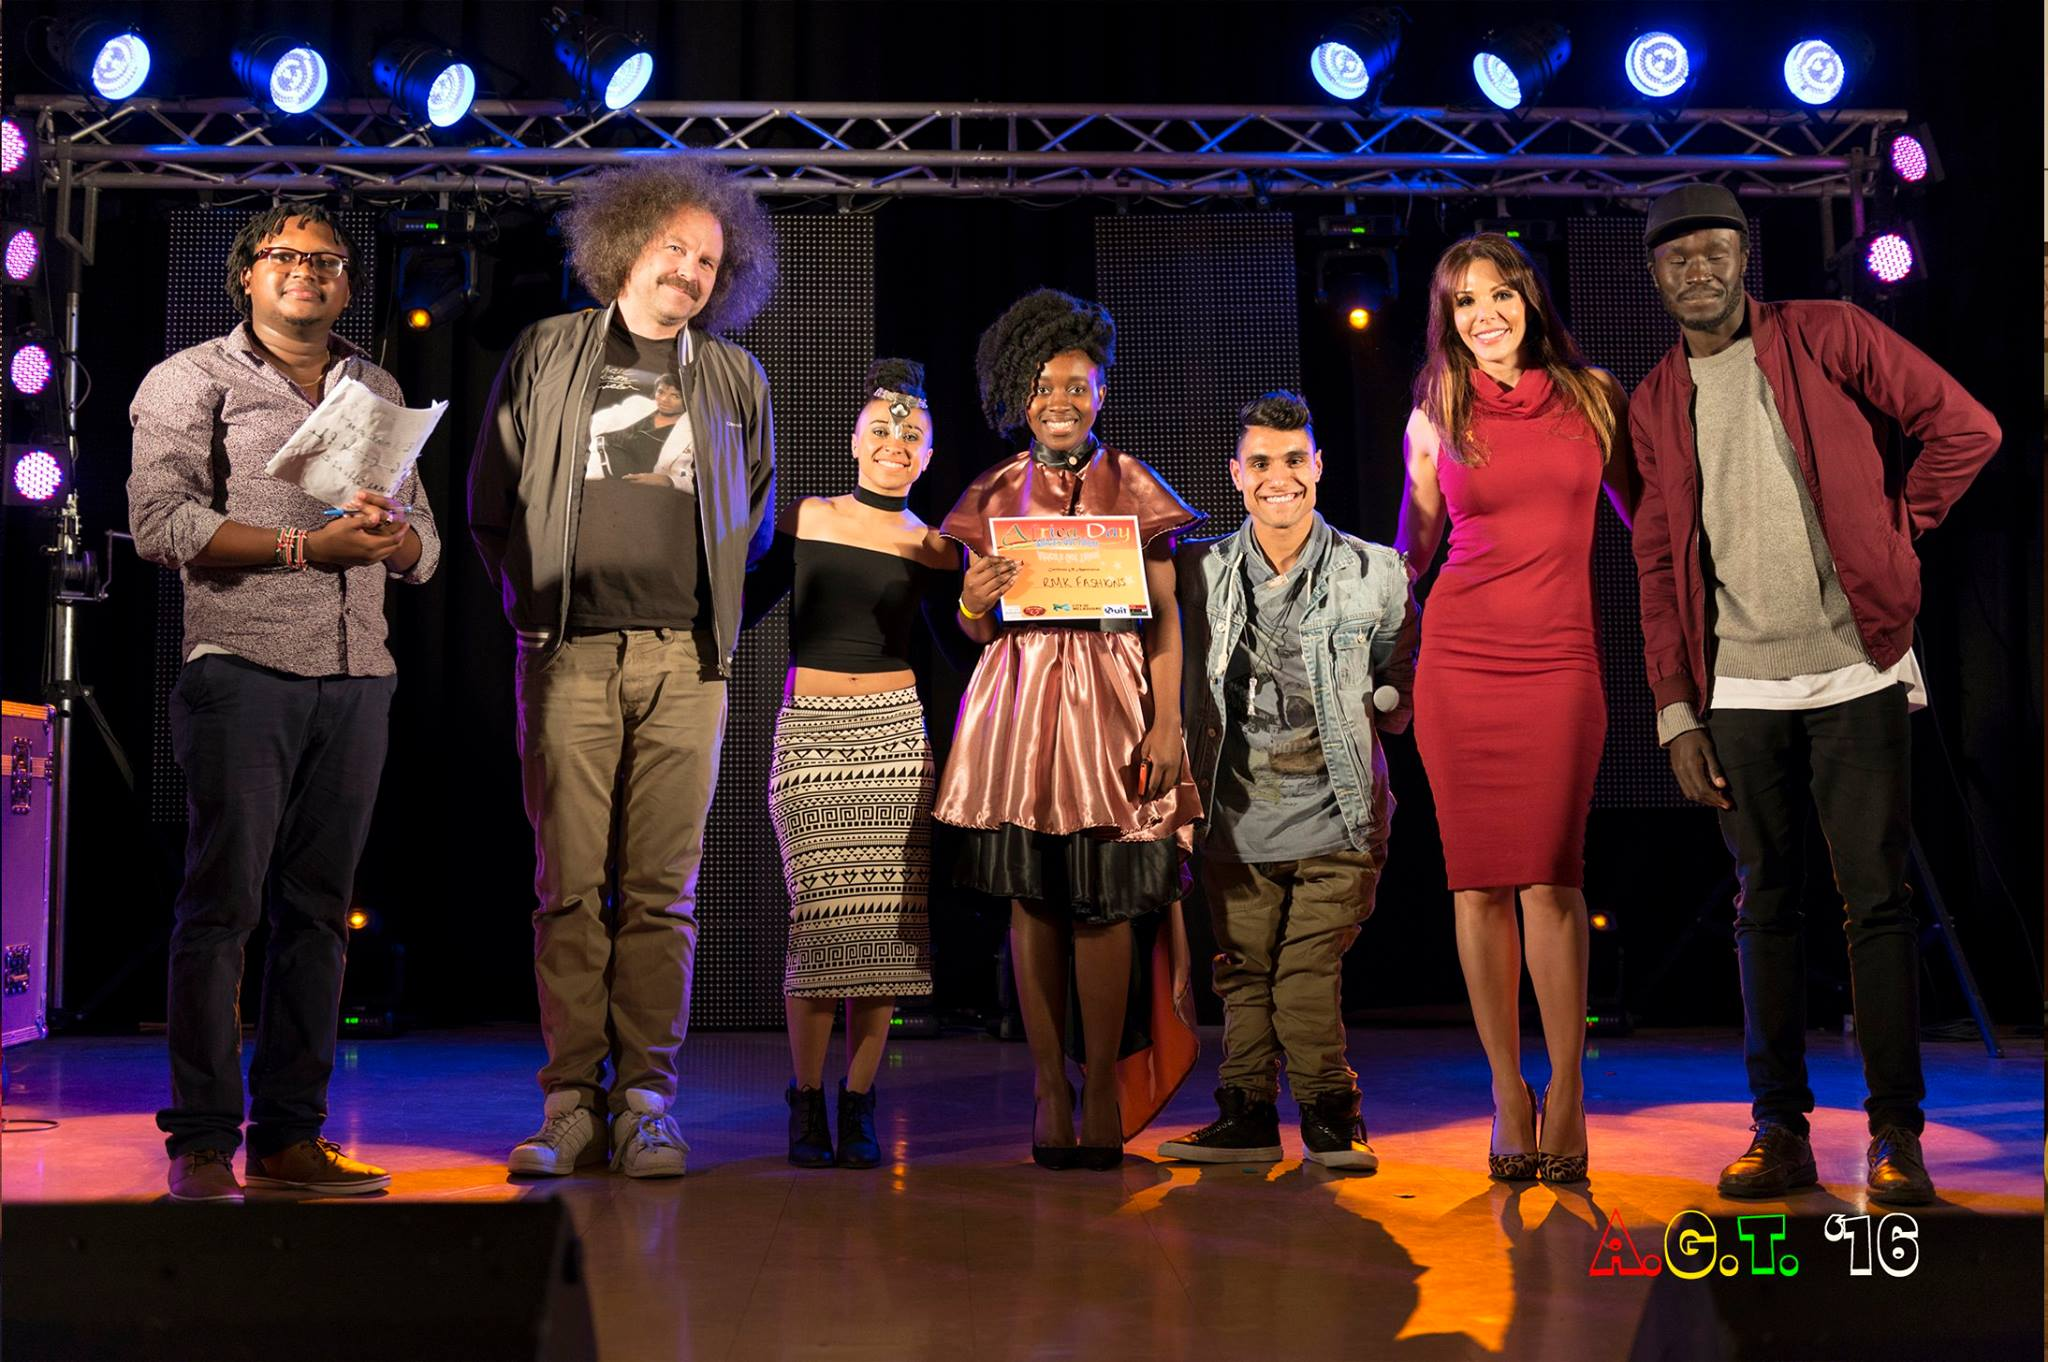 Africa's Got Talent 2016 Judges and Winner - Melbourne, AUS